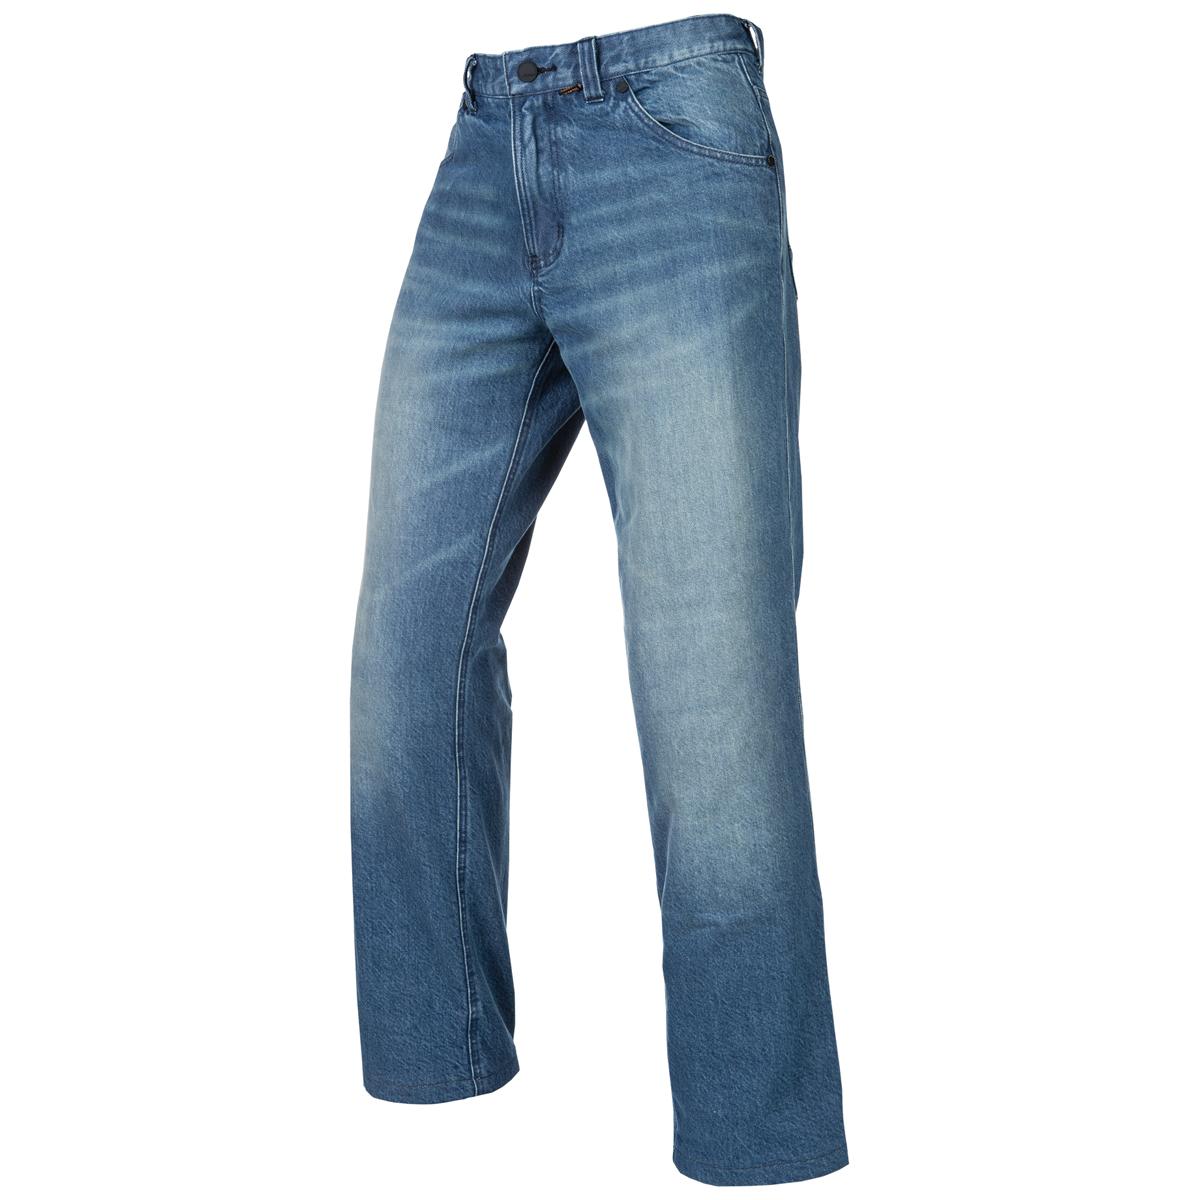 Klim Men's K Fifty 2 Light Blue Riding Jeans